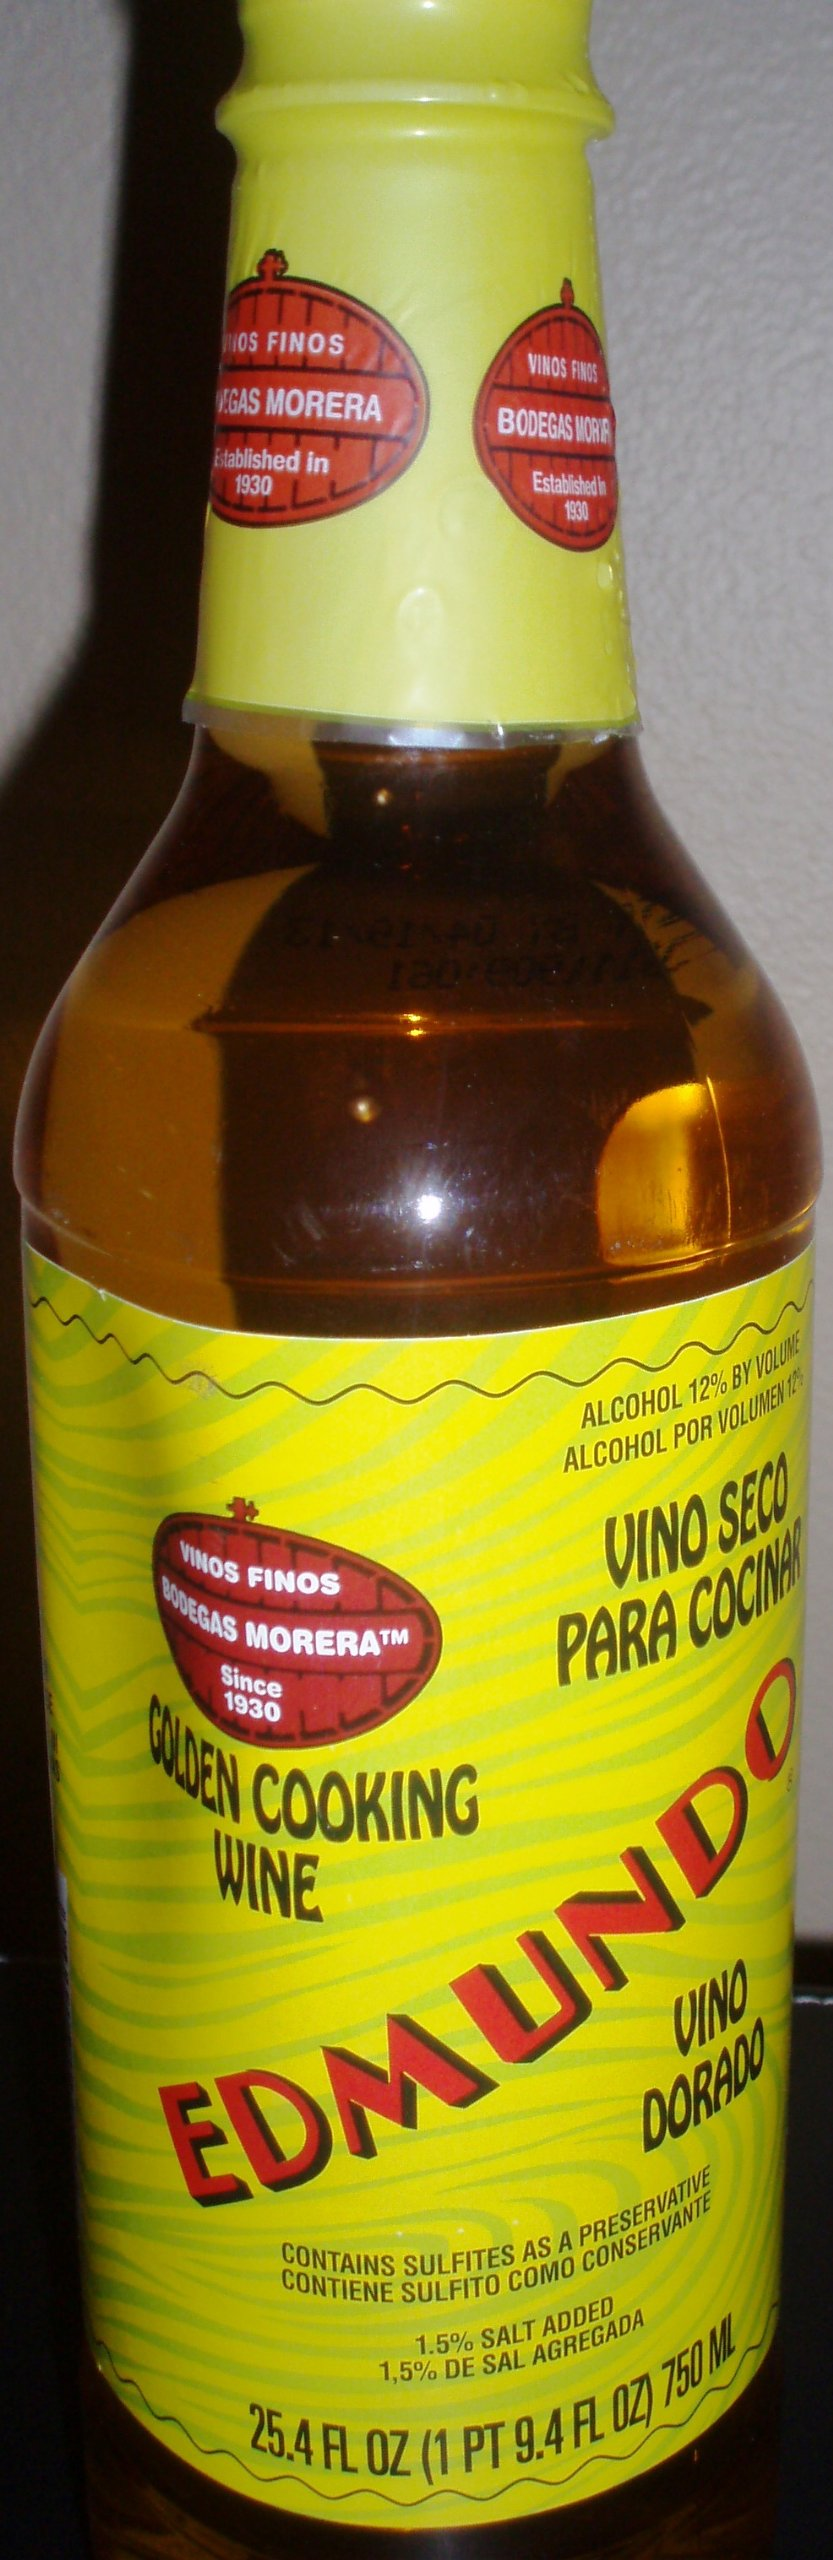 Edmundo, Cook Wine White Goldn, 25.4 Oz by Edmundo